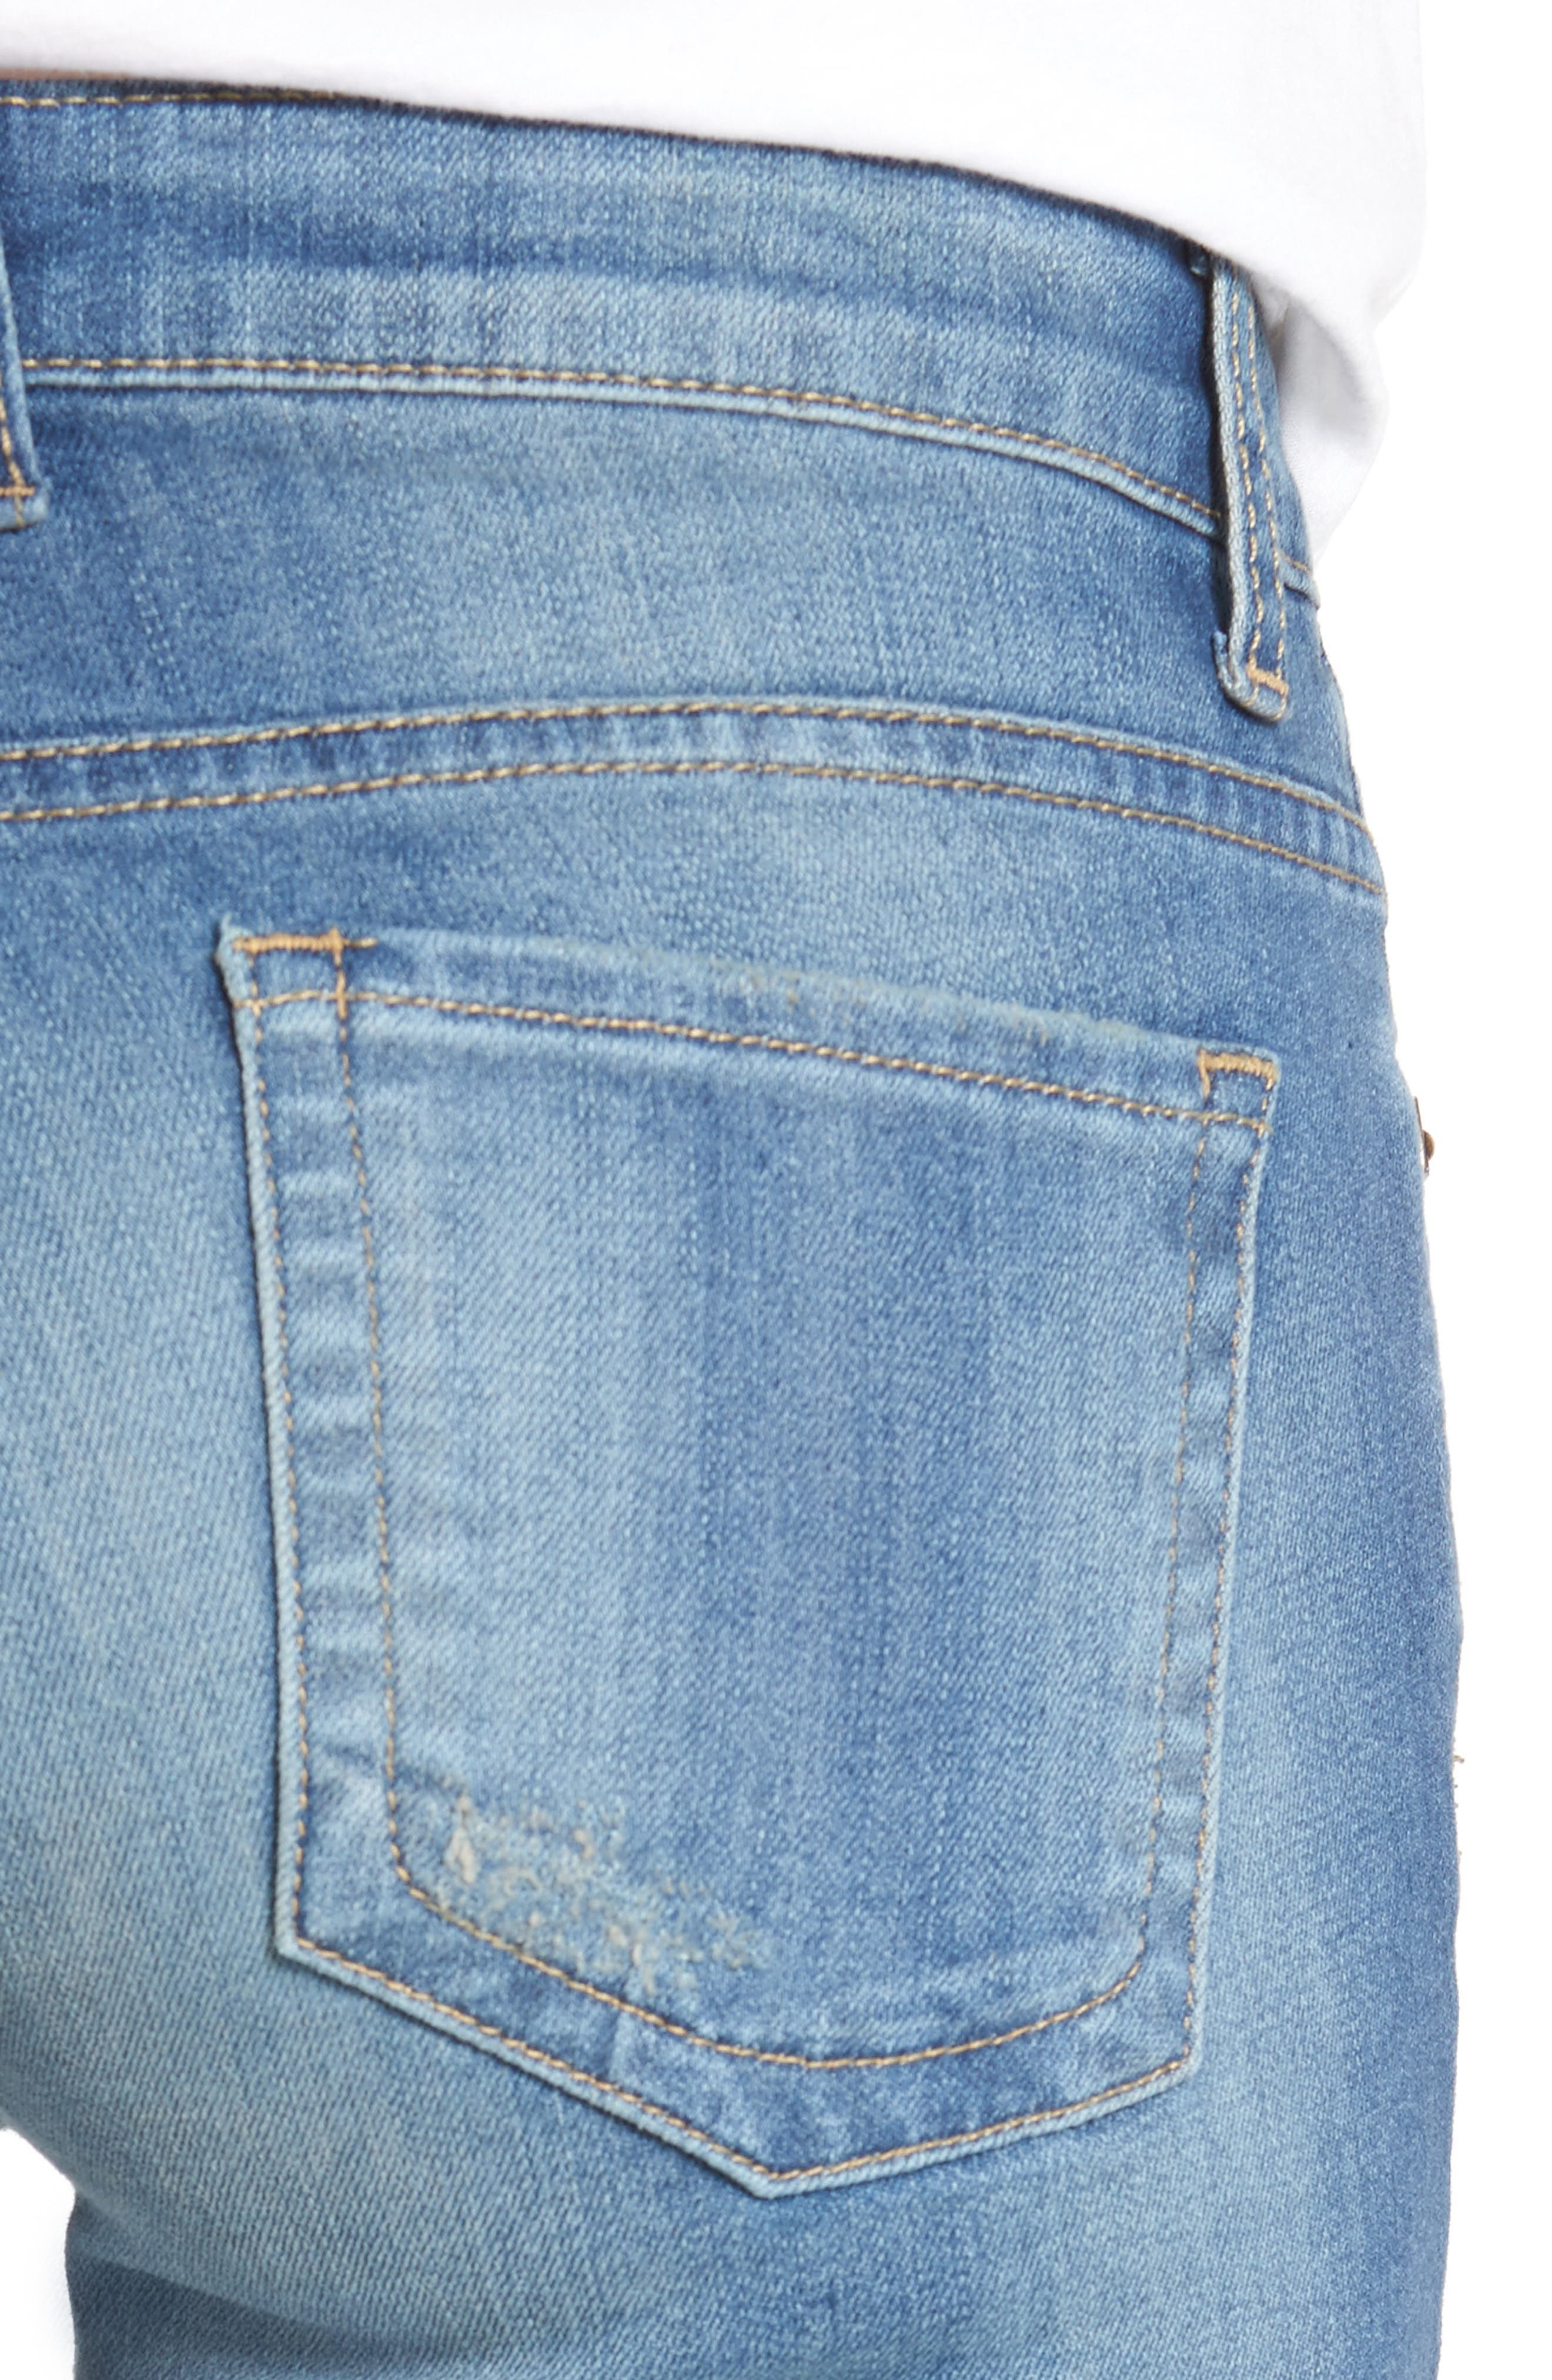 Alternate Image 4  - KUT from the Kloth Catherine Distressed Boyfriend Jeans (Fiery) (Regular & Petite)